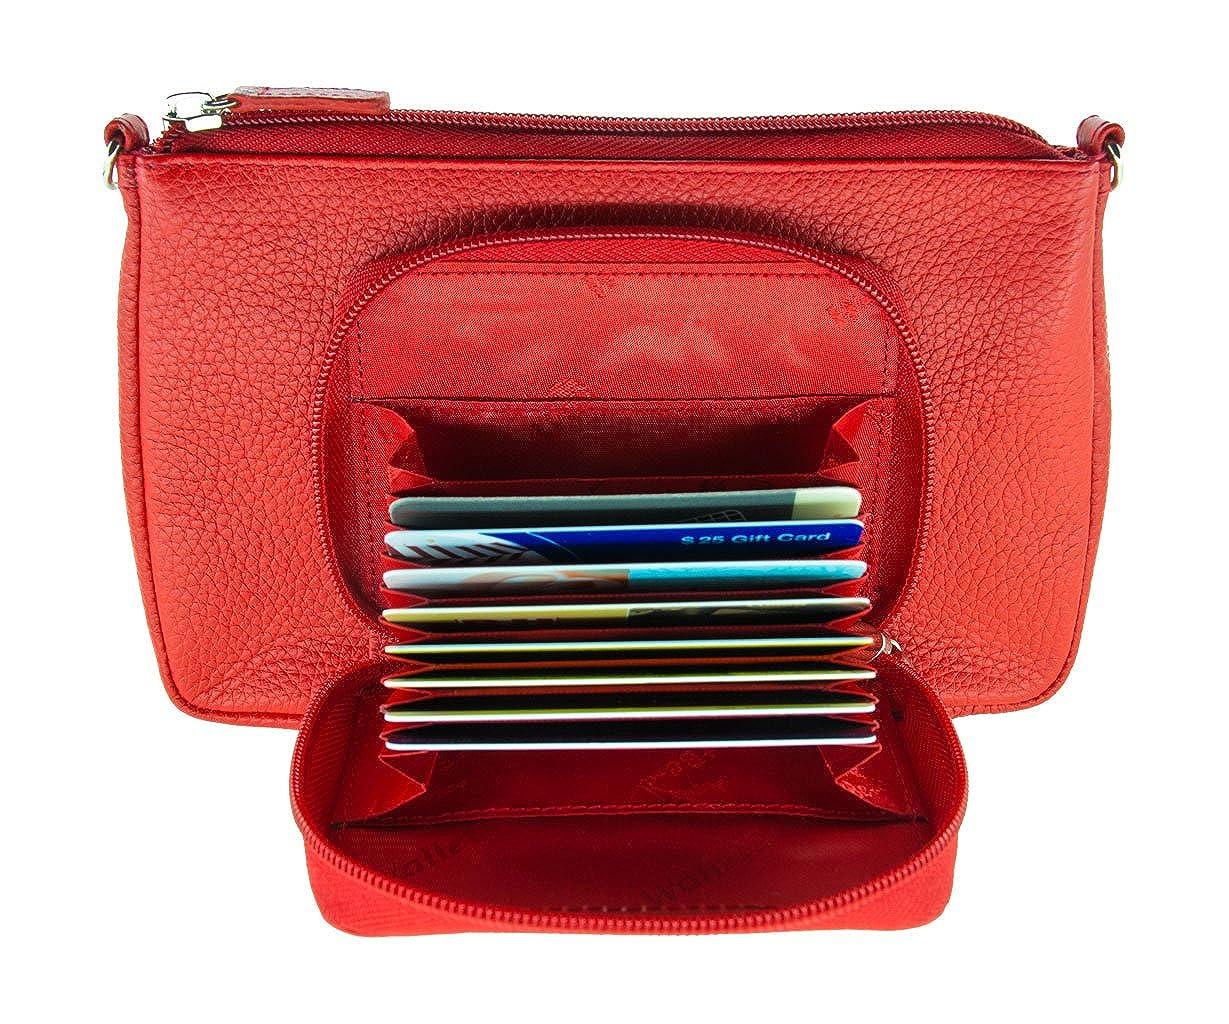 WalletBe Womens Leather Crossbody RFID Mini Purse with Accordion Wallet